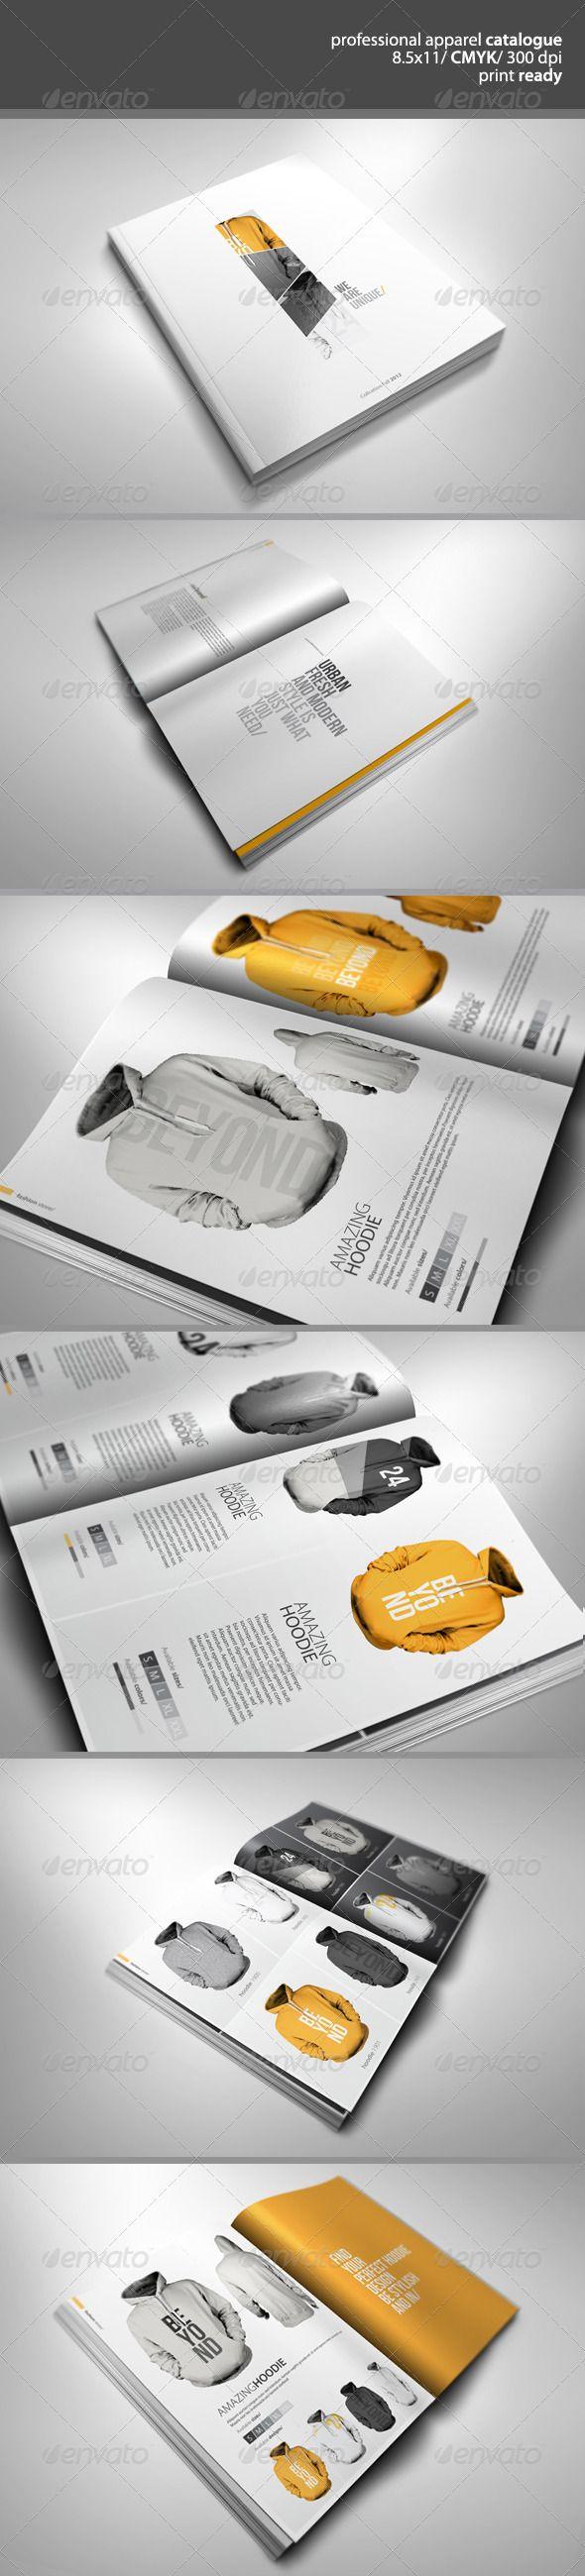 Professional Apparel Catalogue - GraphicRiver Item for Sale                                                                                                                                                                                 More